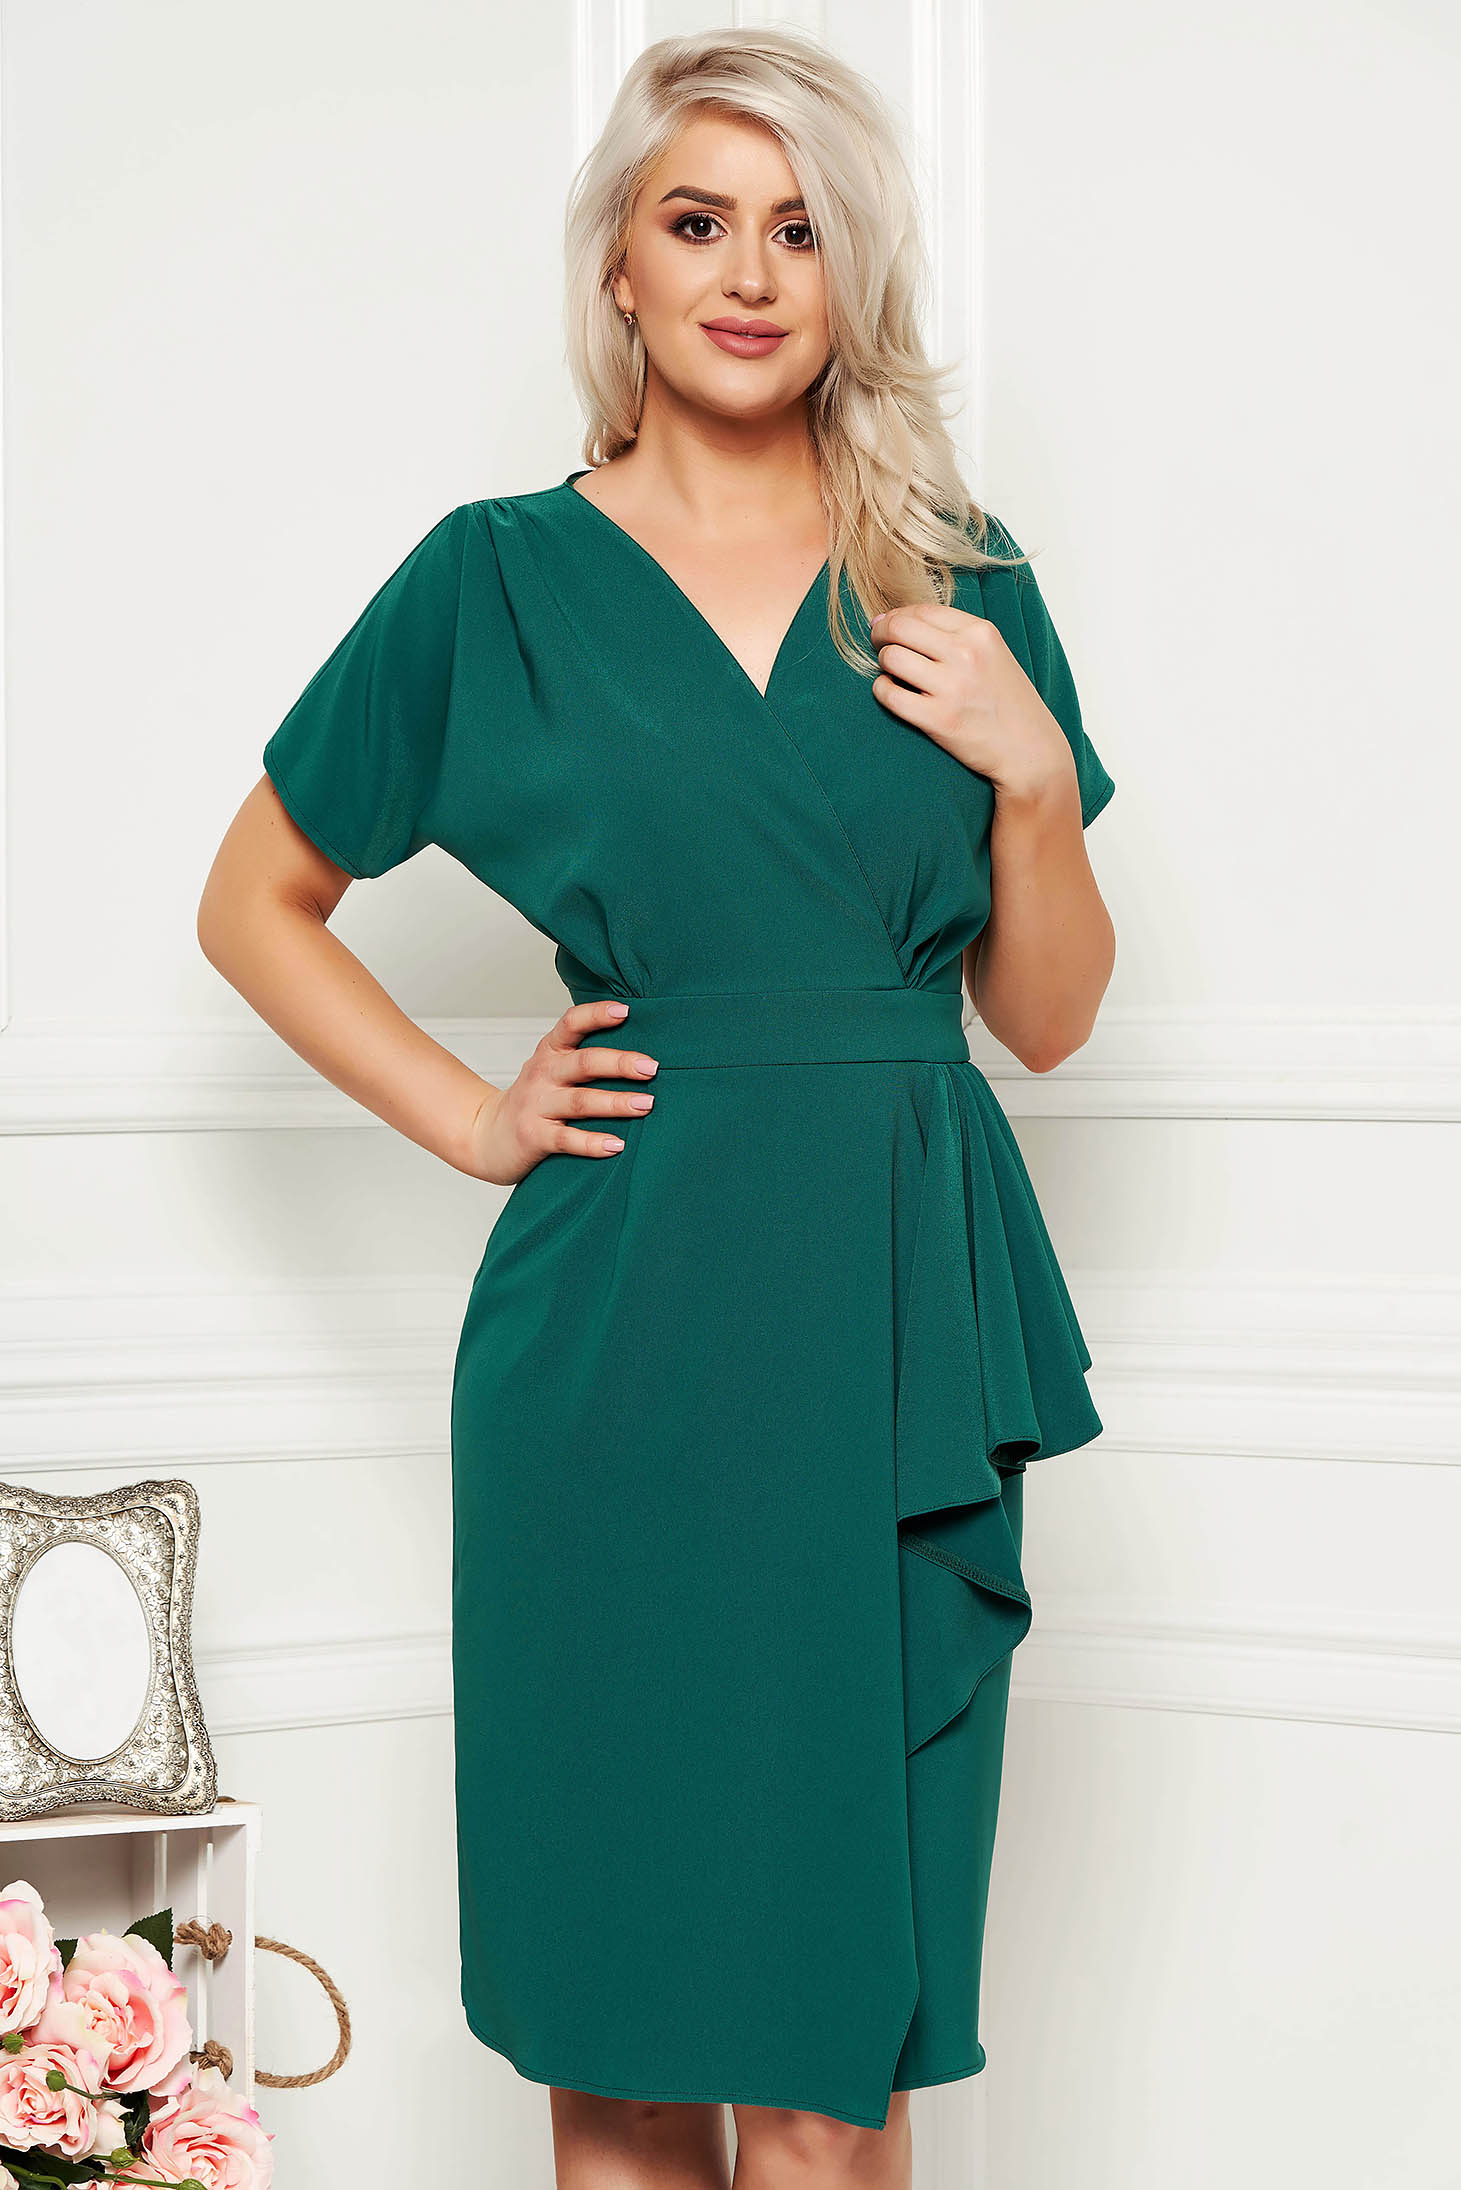 Rochie verde midi eleganta tip creion din stofa decupata pe picior cu decolteu in v si volanase